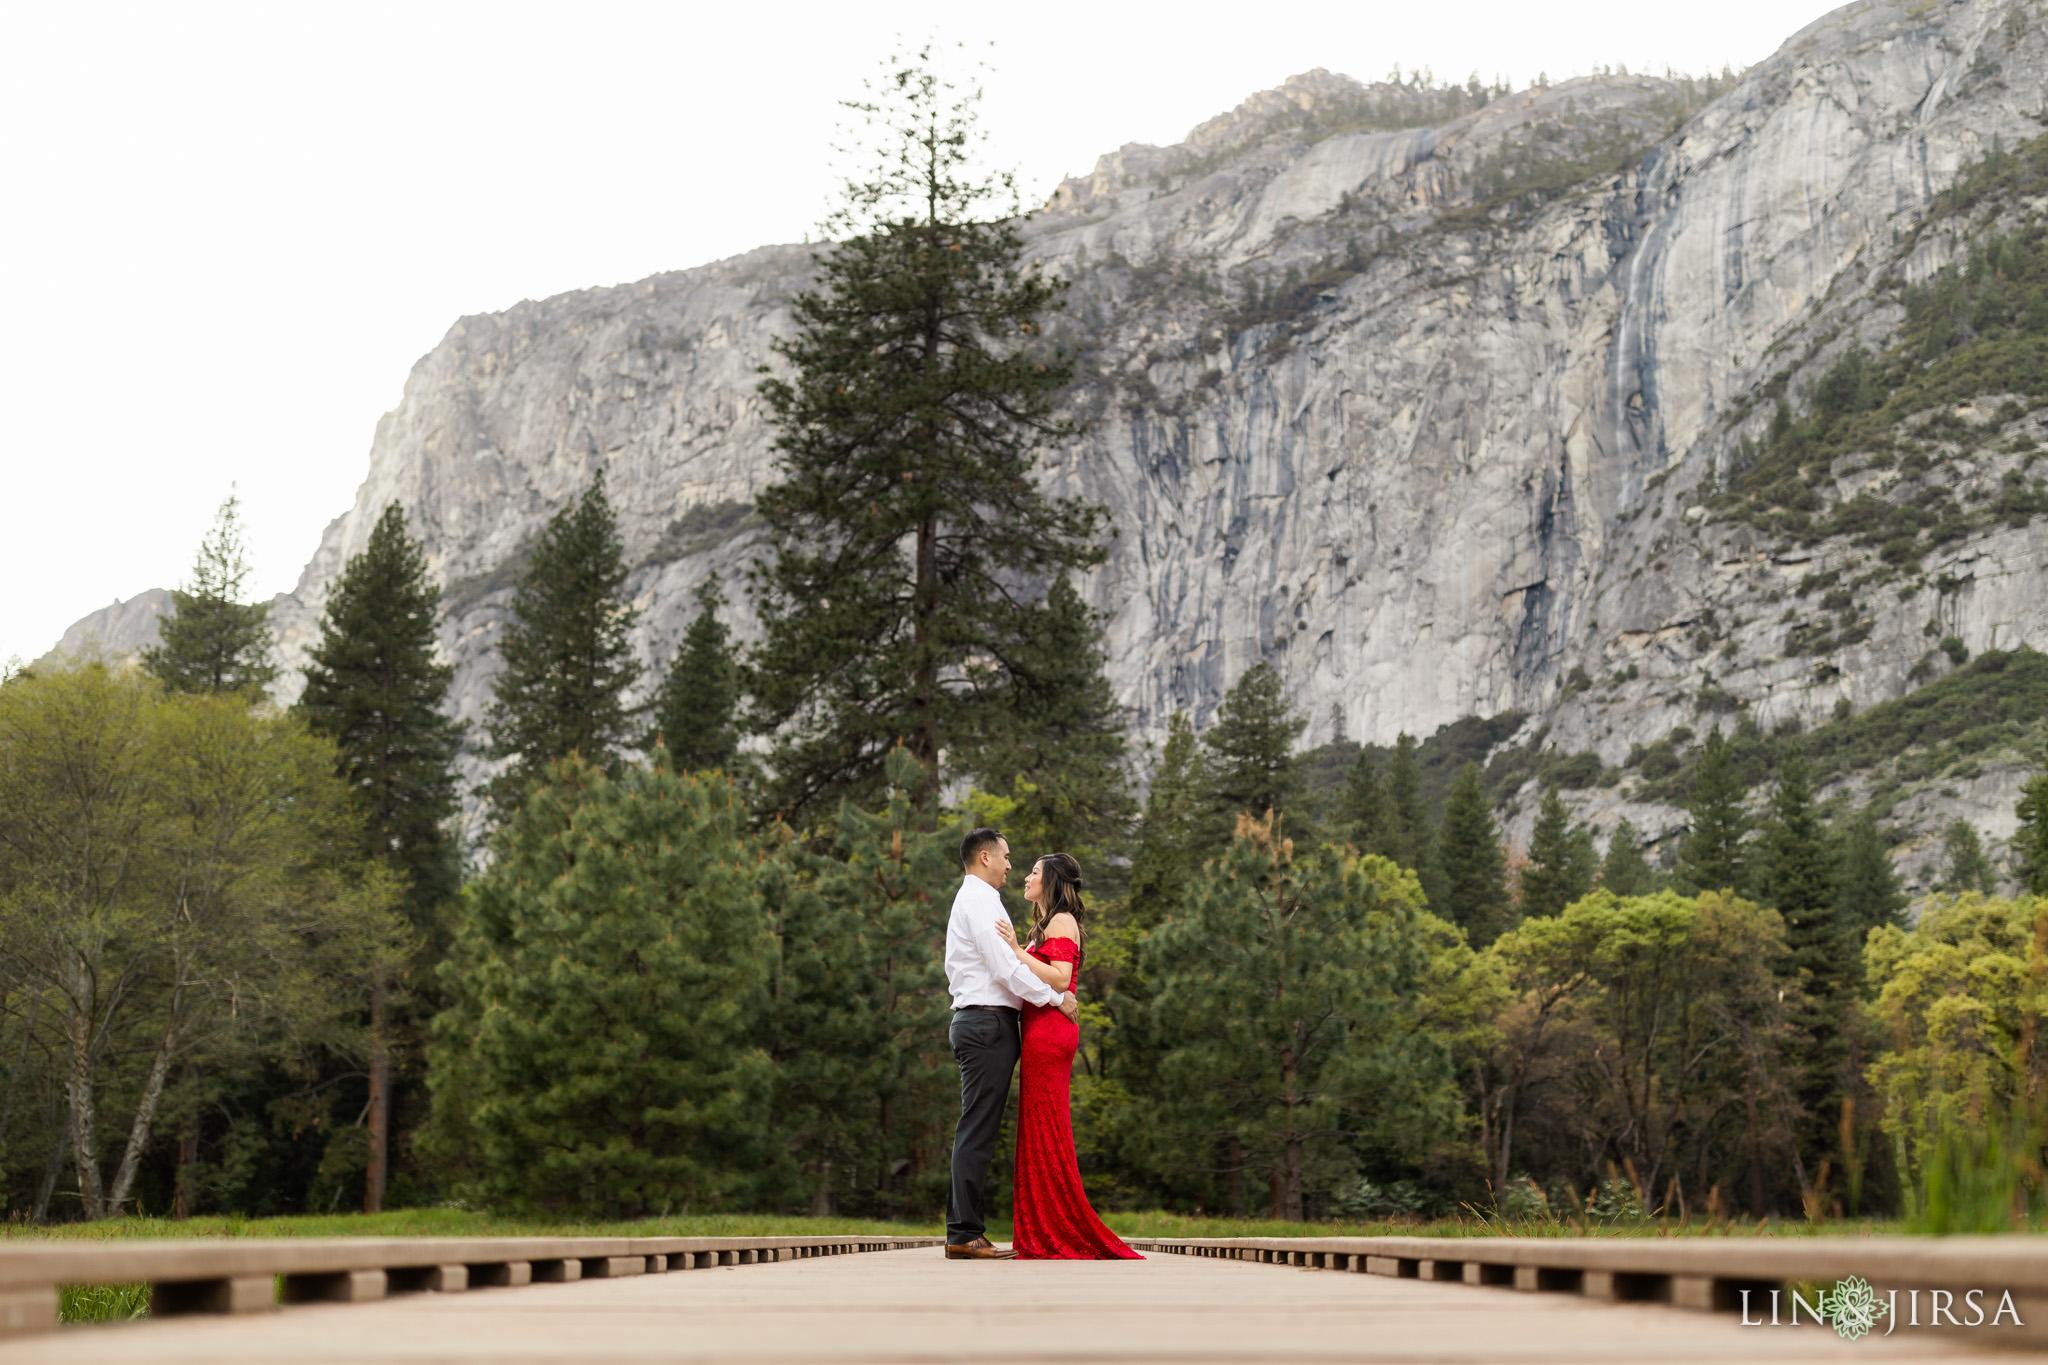 08 Yosemite National Park Travel Destination Engagement Photography